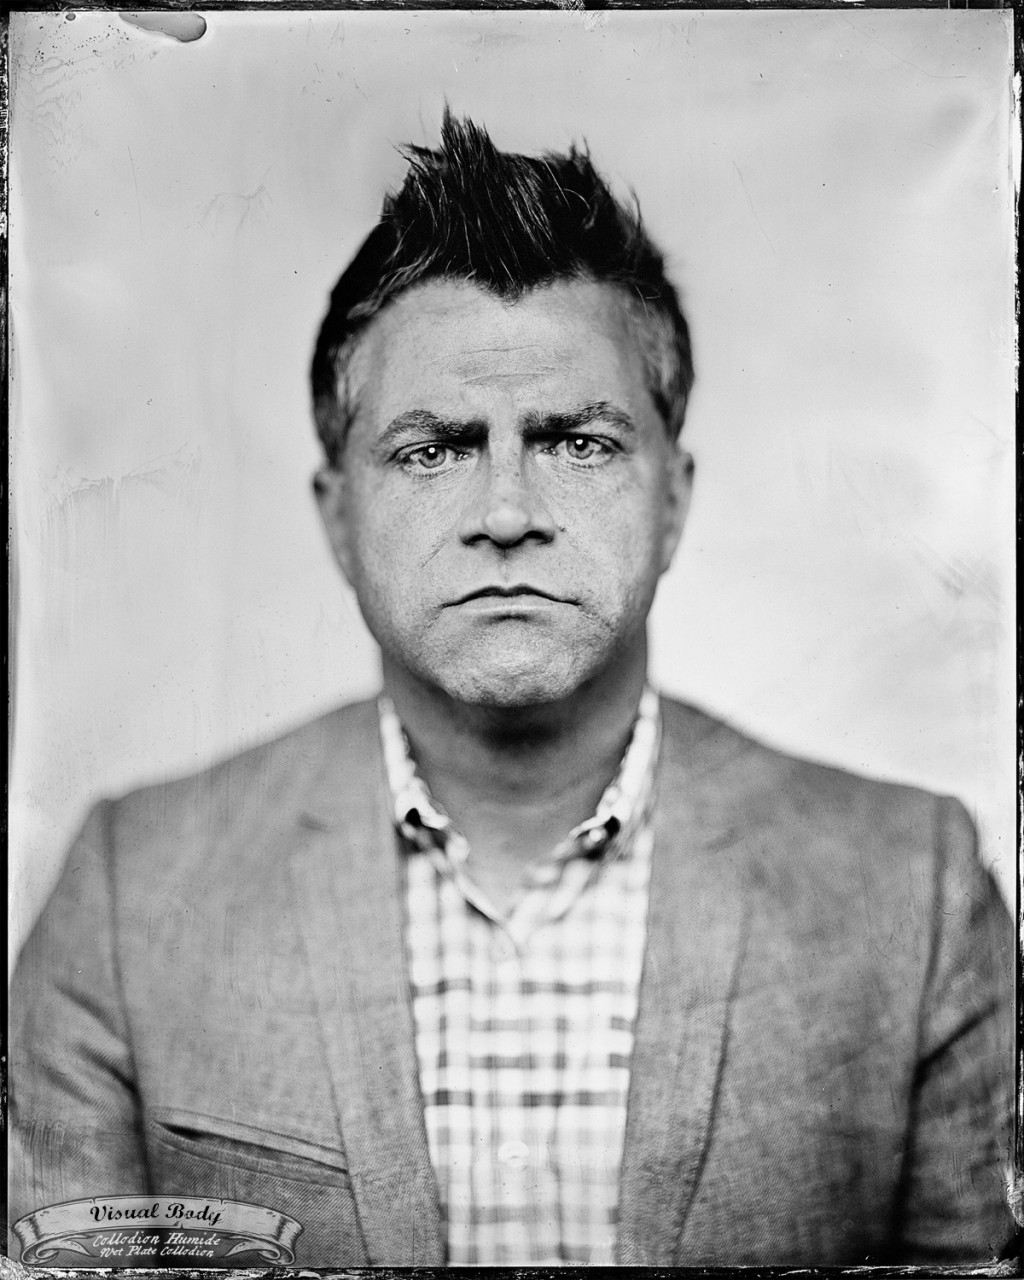 Patrick Groulx. Profession: humoriste/comedian.